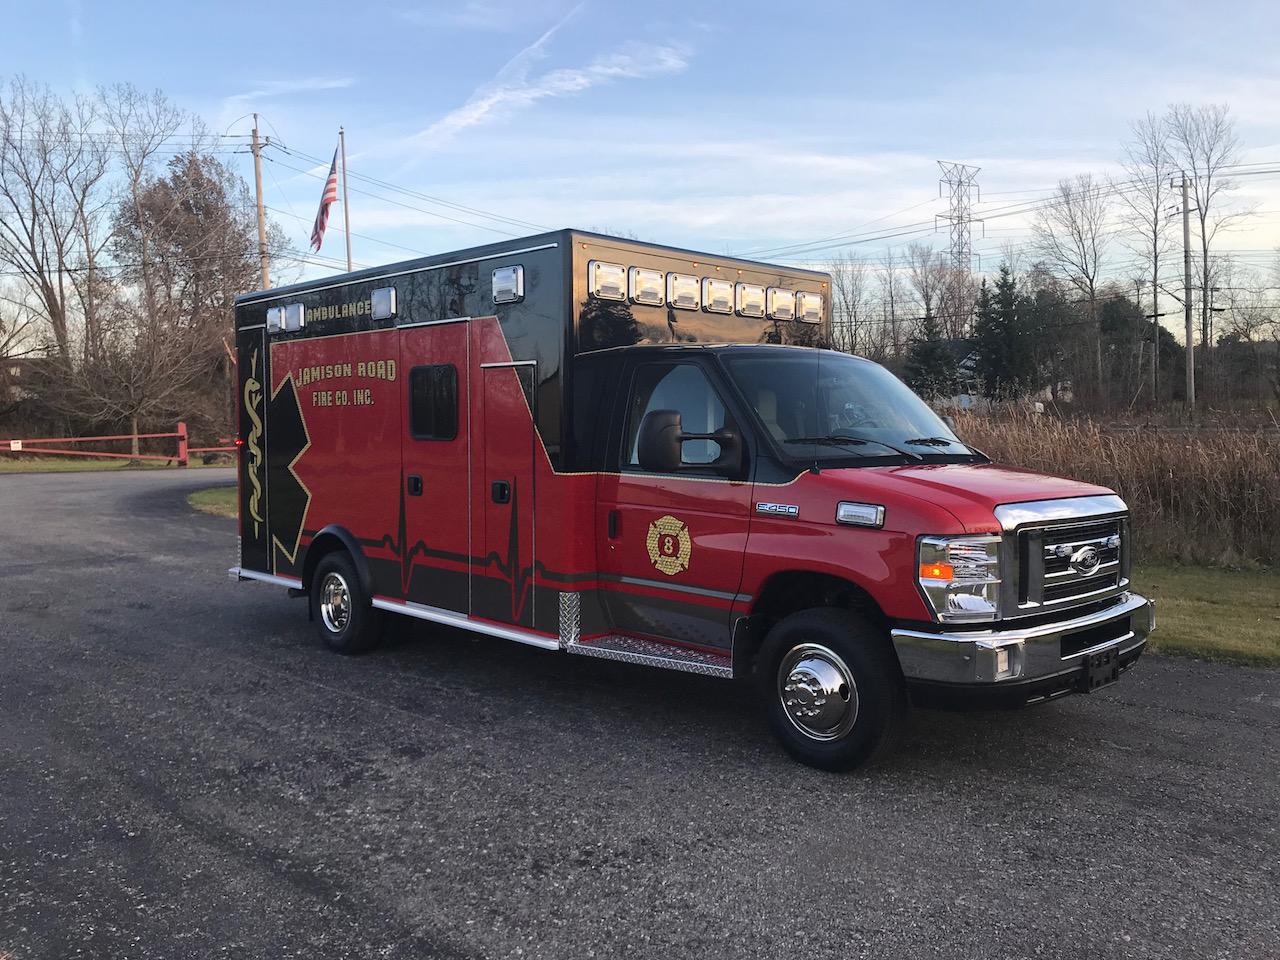 Medix Ambulance - Jamison Road - 4